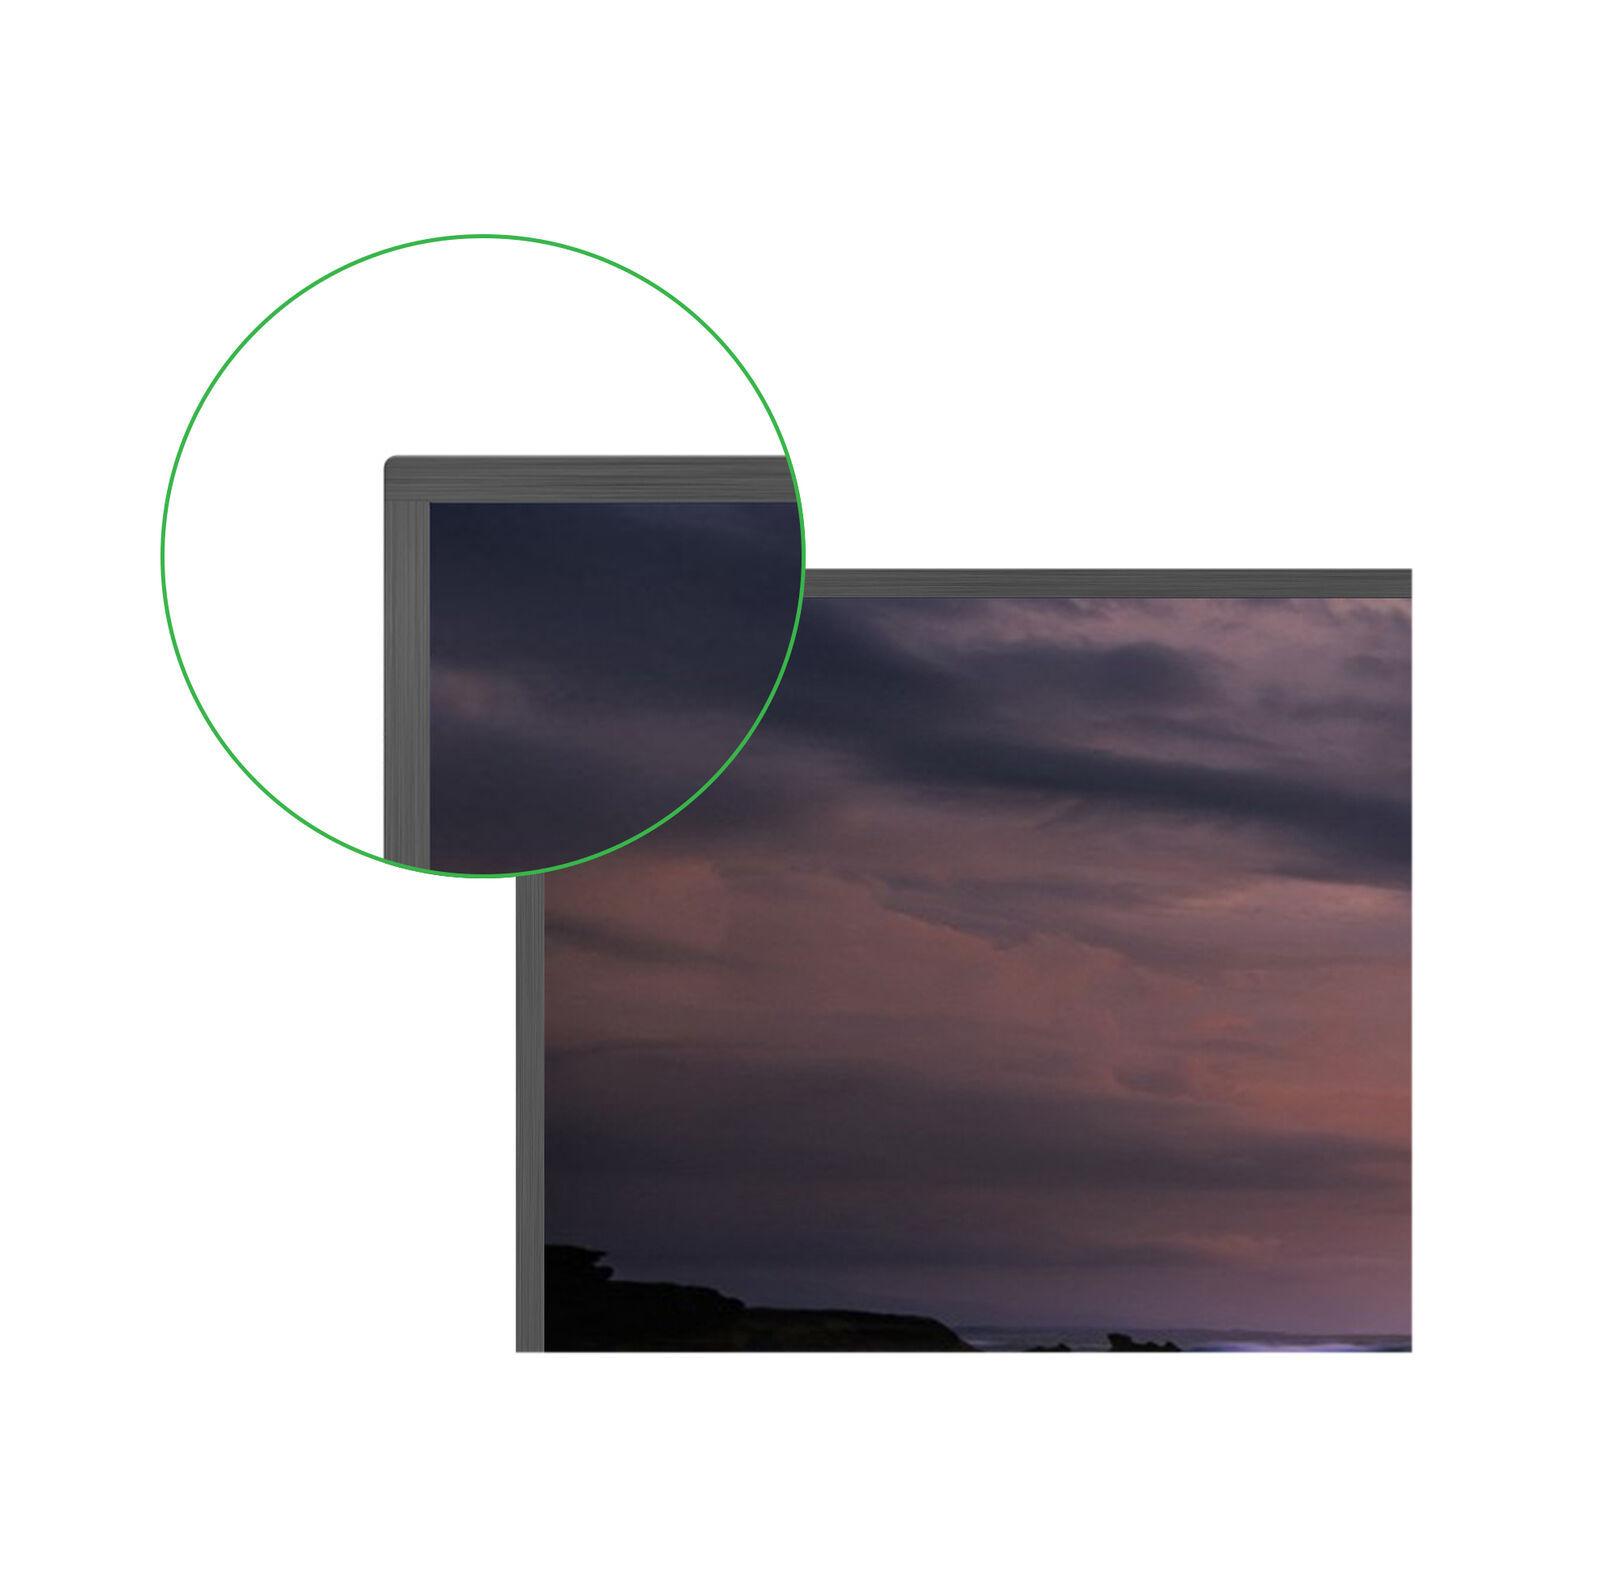 "Sceptre 75"" Class 4K Ultra HD (2160P) LED TV (U750CV-U) image 5"